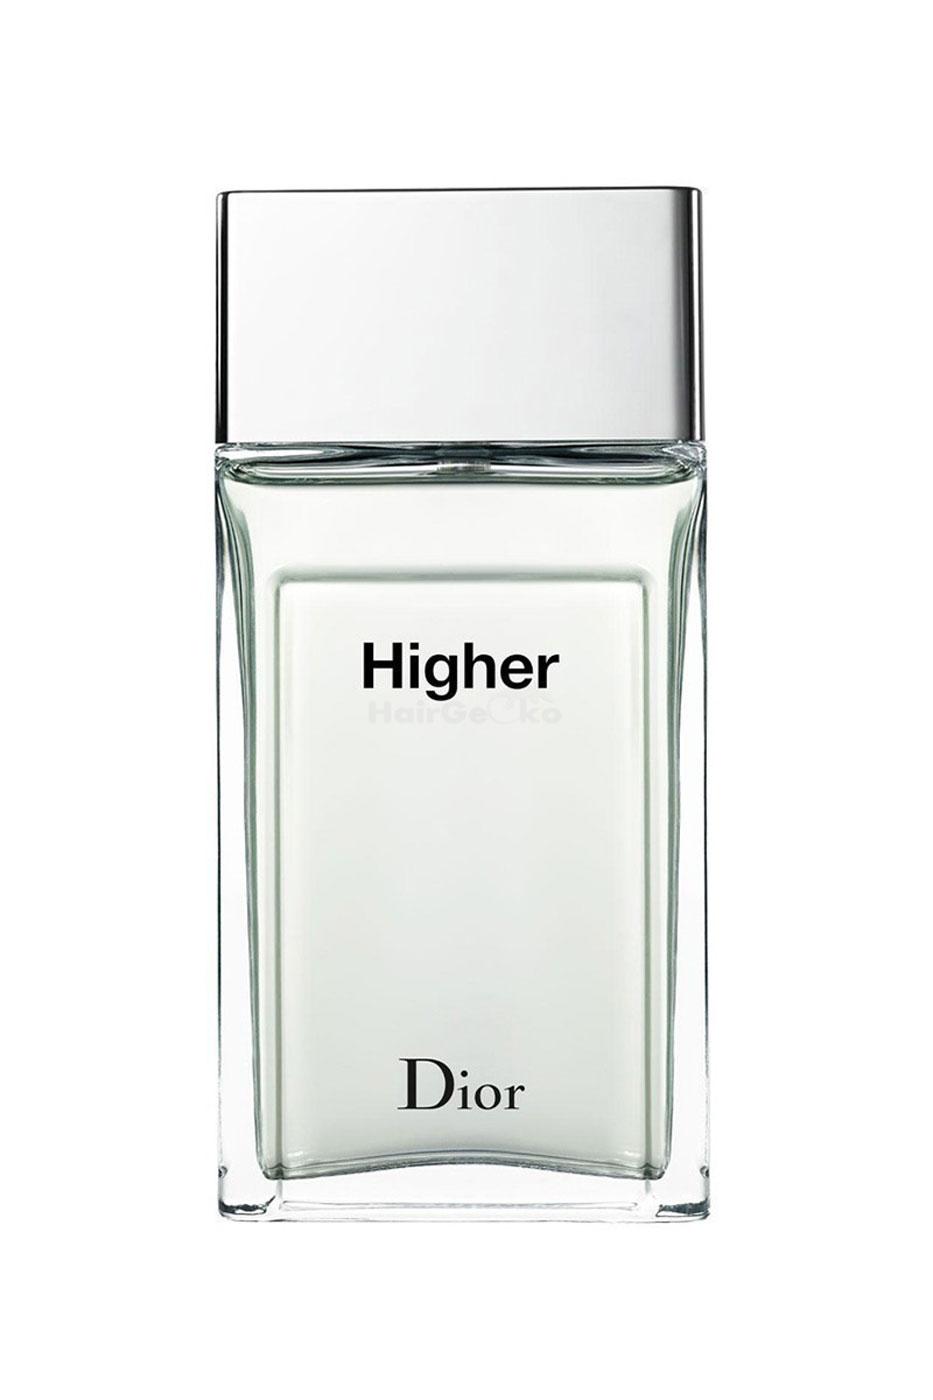 Dior Higher Eau de Toilette (EDT) Spray 100ml